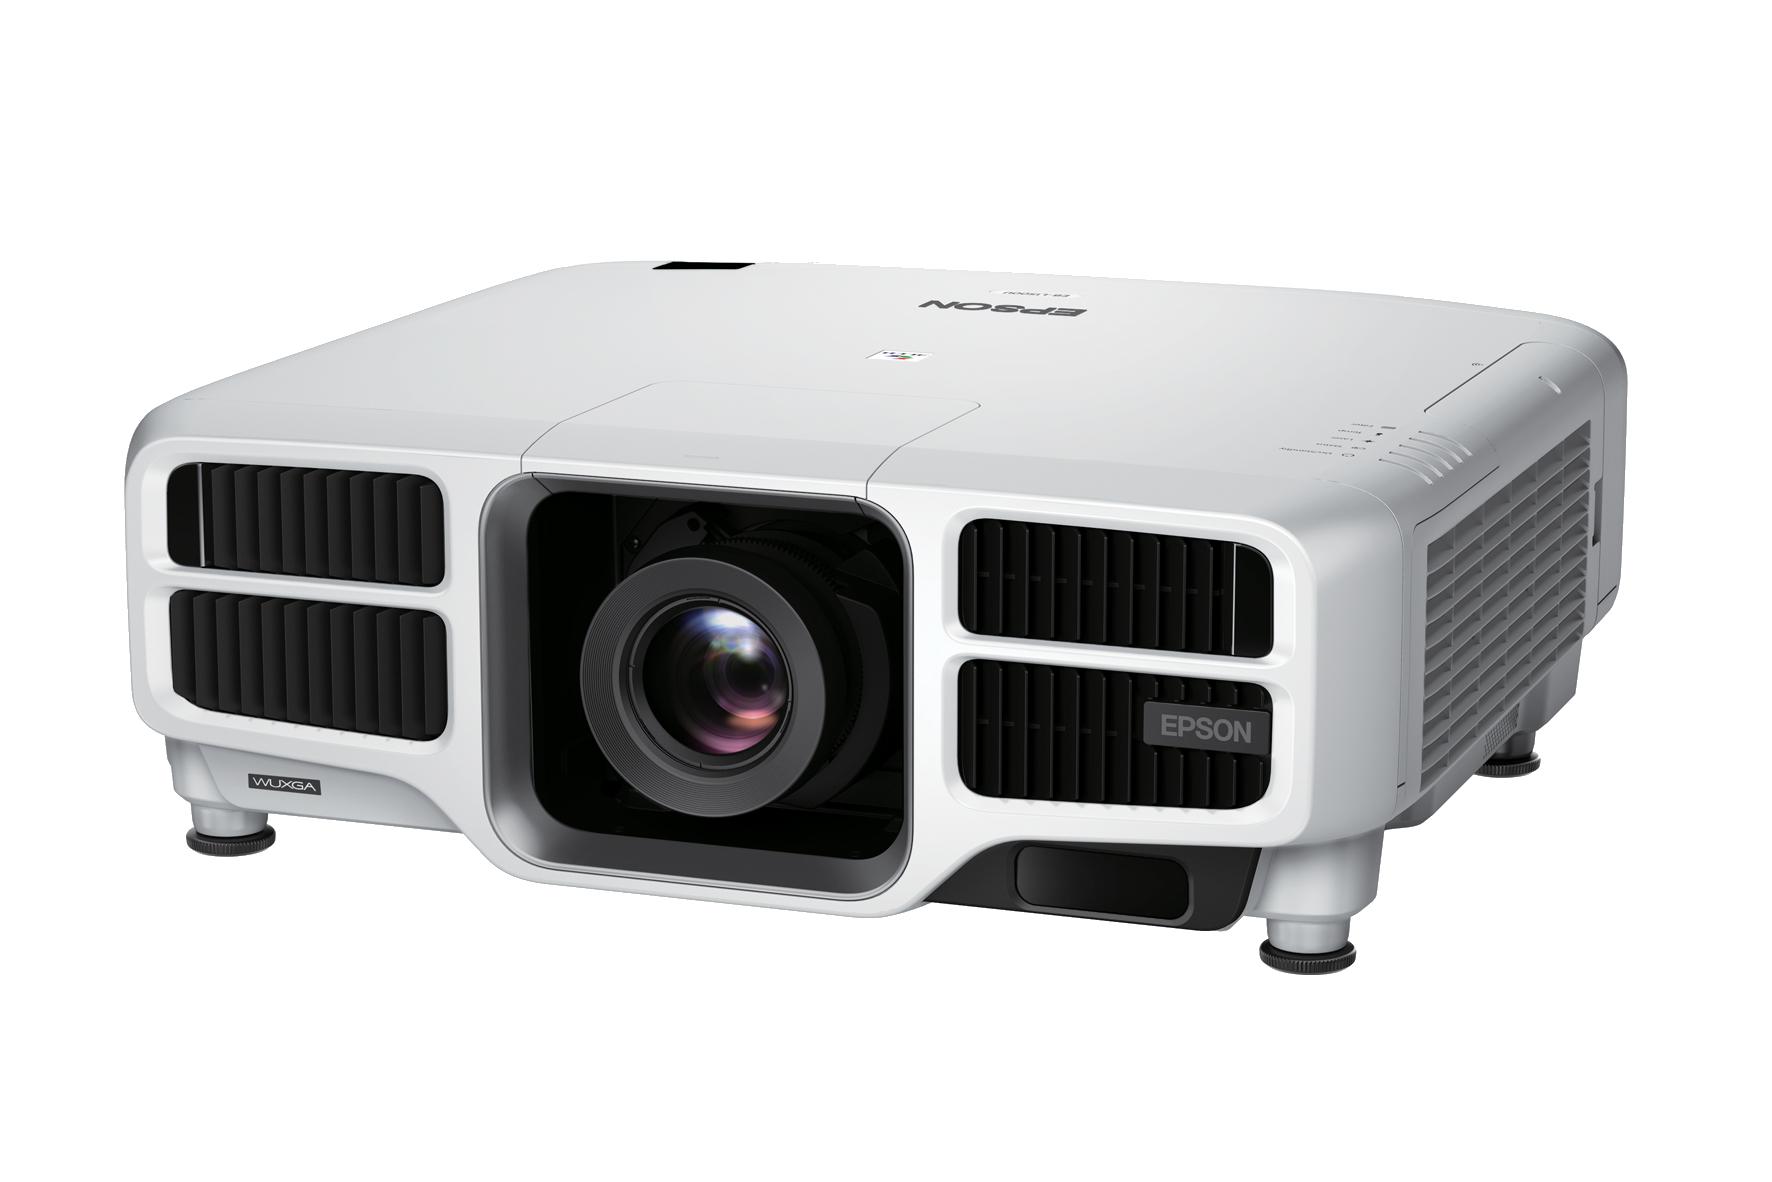 Projector 8000 Epson